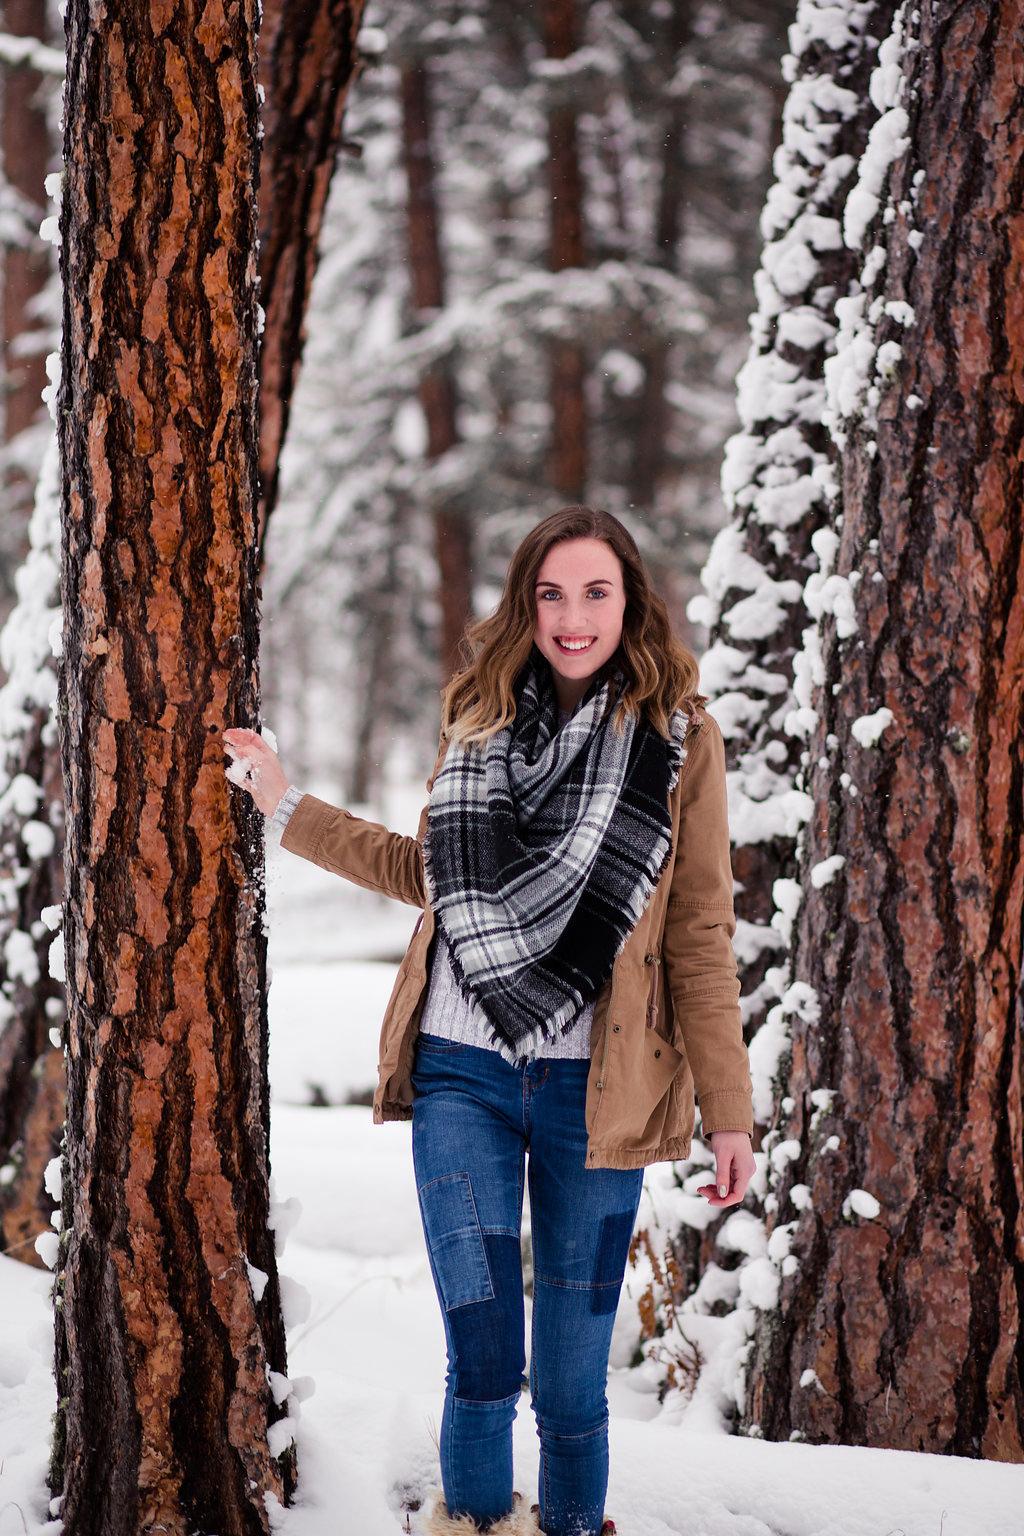 missoula-montana-senior-photographer-apaytonphoto-61.jpg